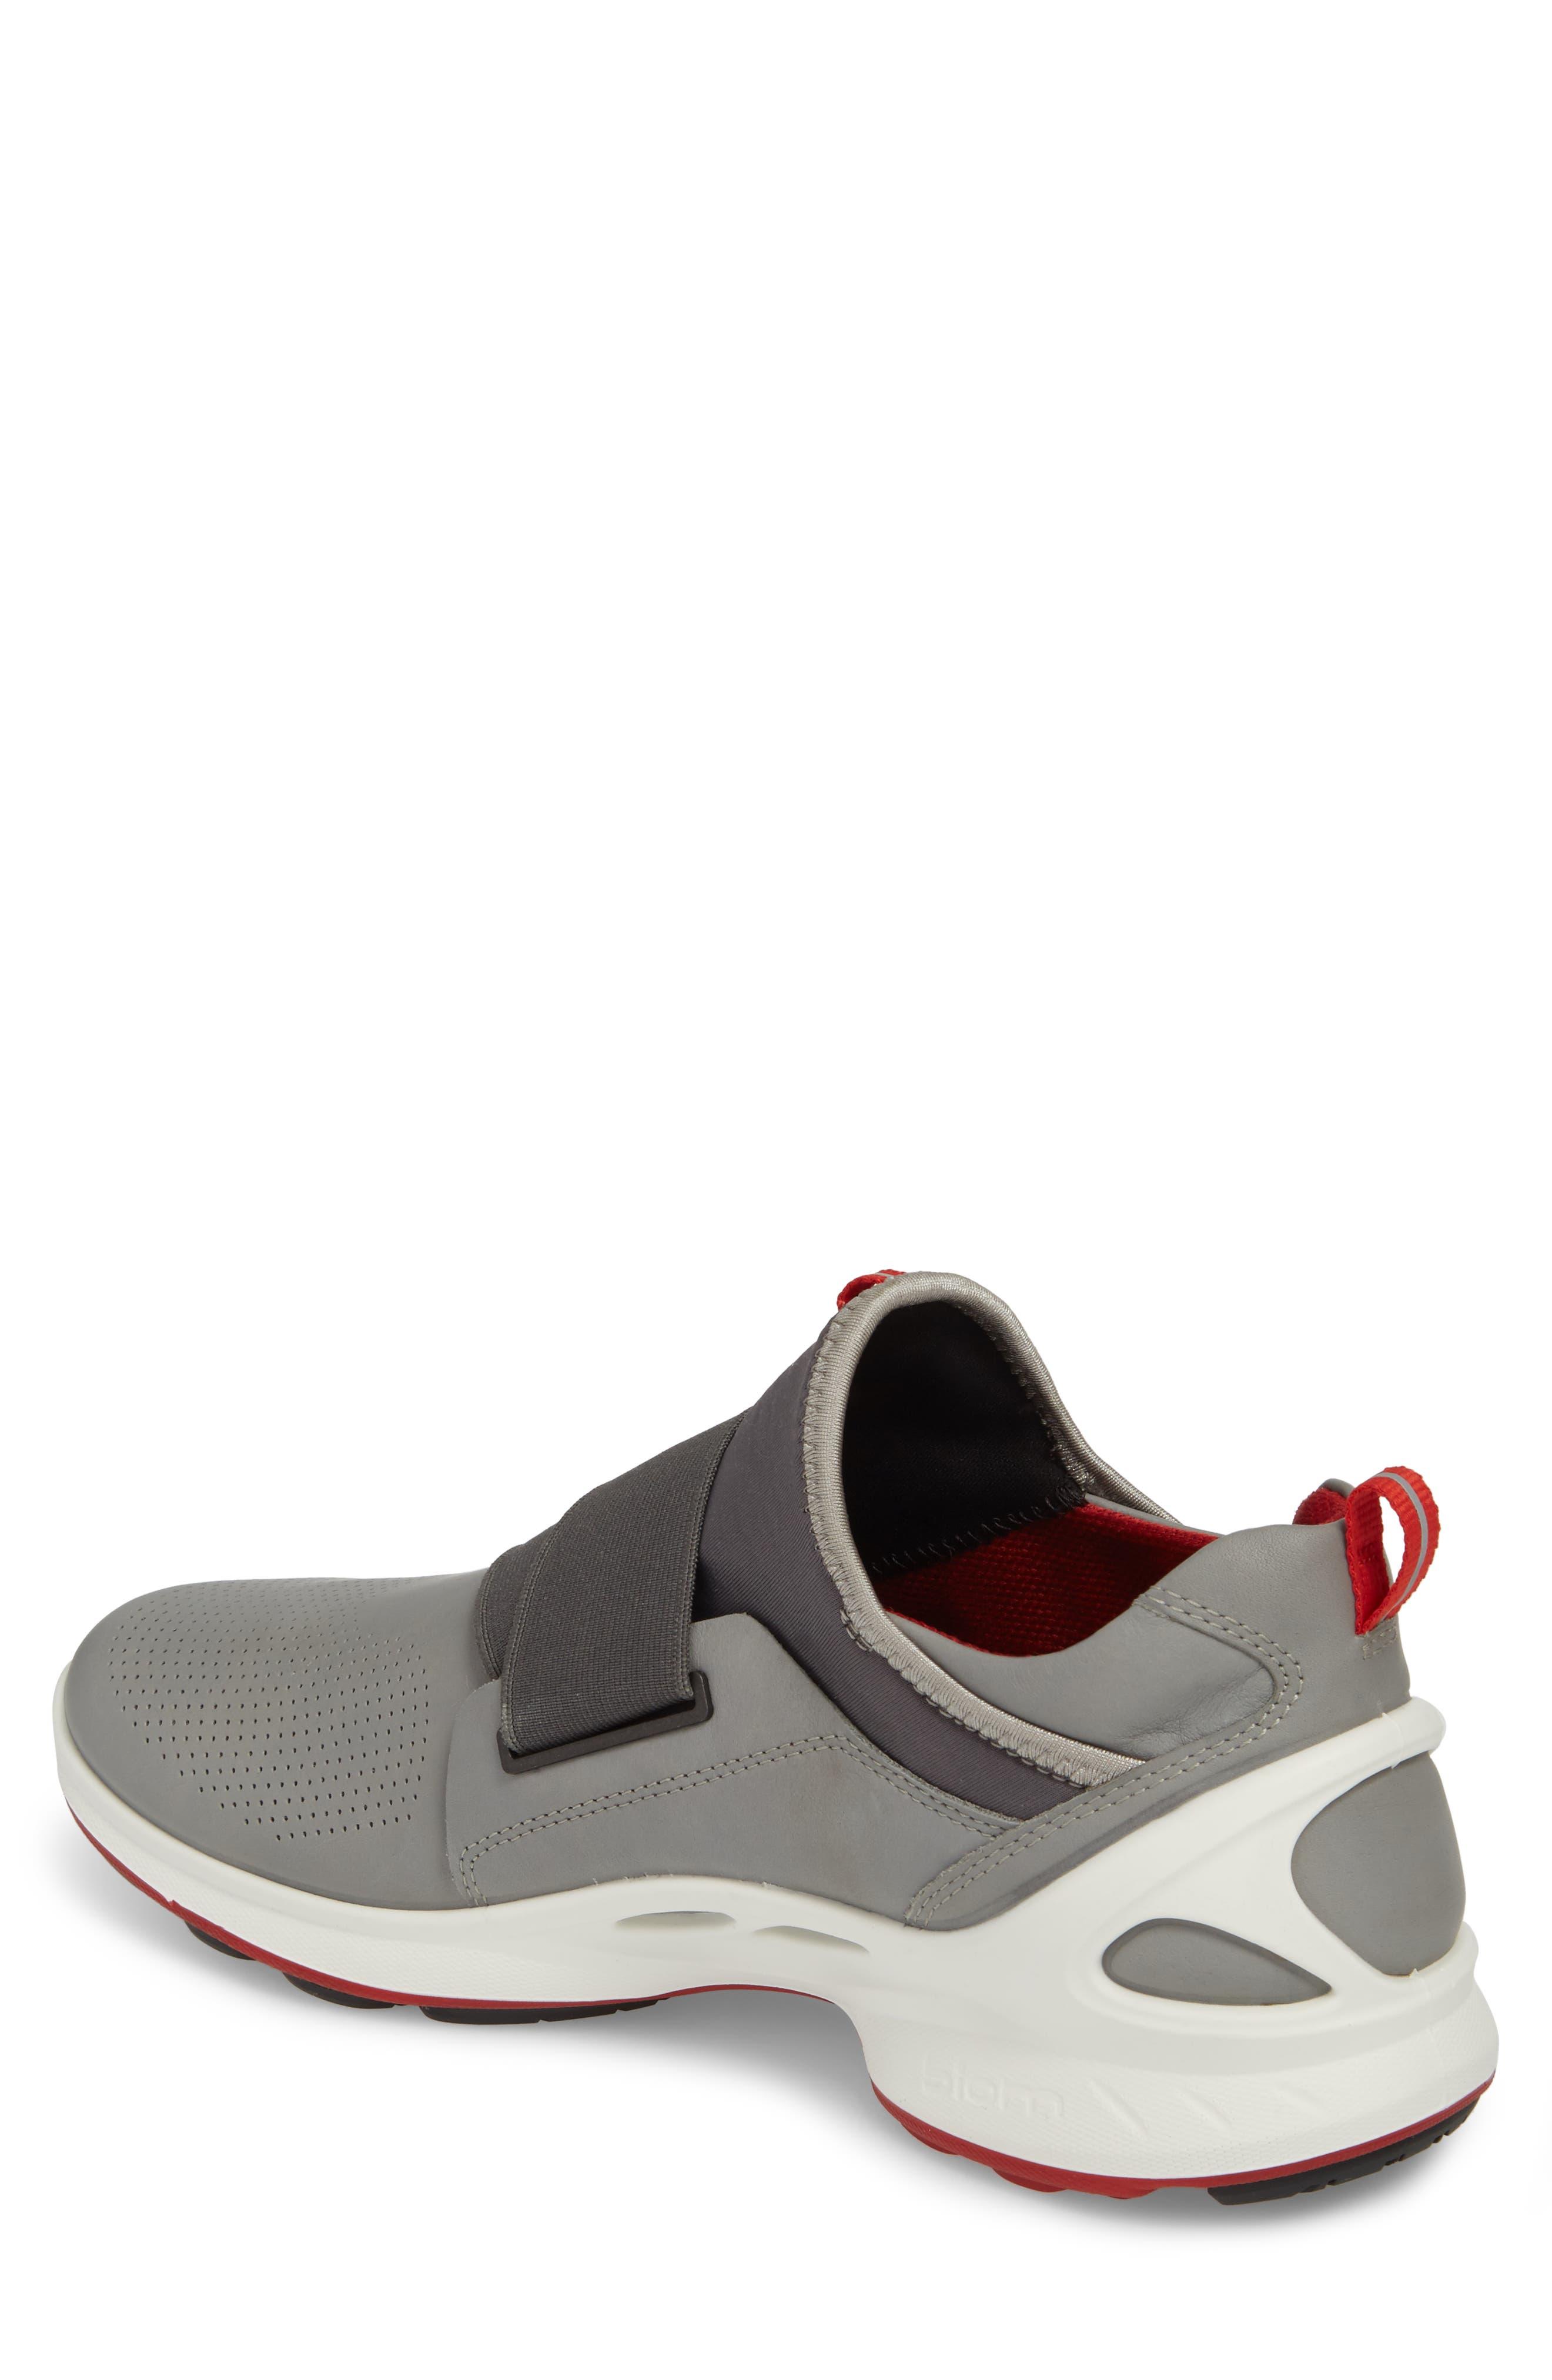 BIOM Fjuel Band Sneaker,                             Alternate thumbnail 2, color,                             Dark Shadow/ Titanium Leather